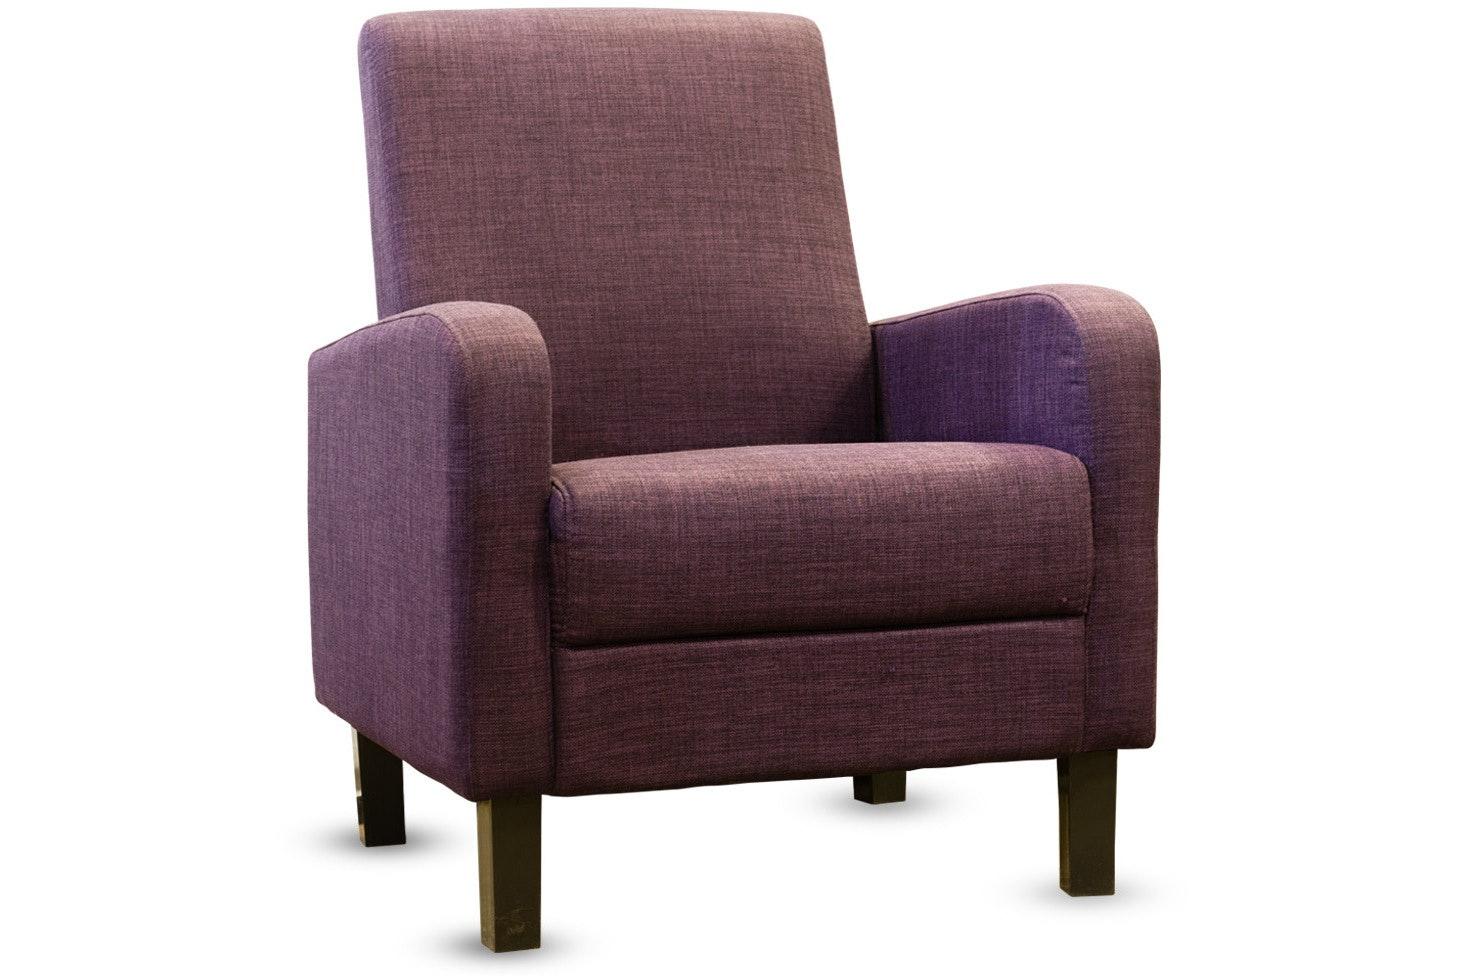 Grady armchair purple ireland